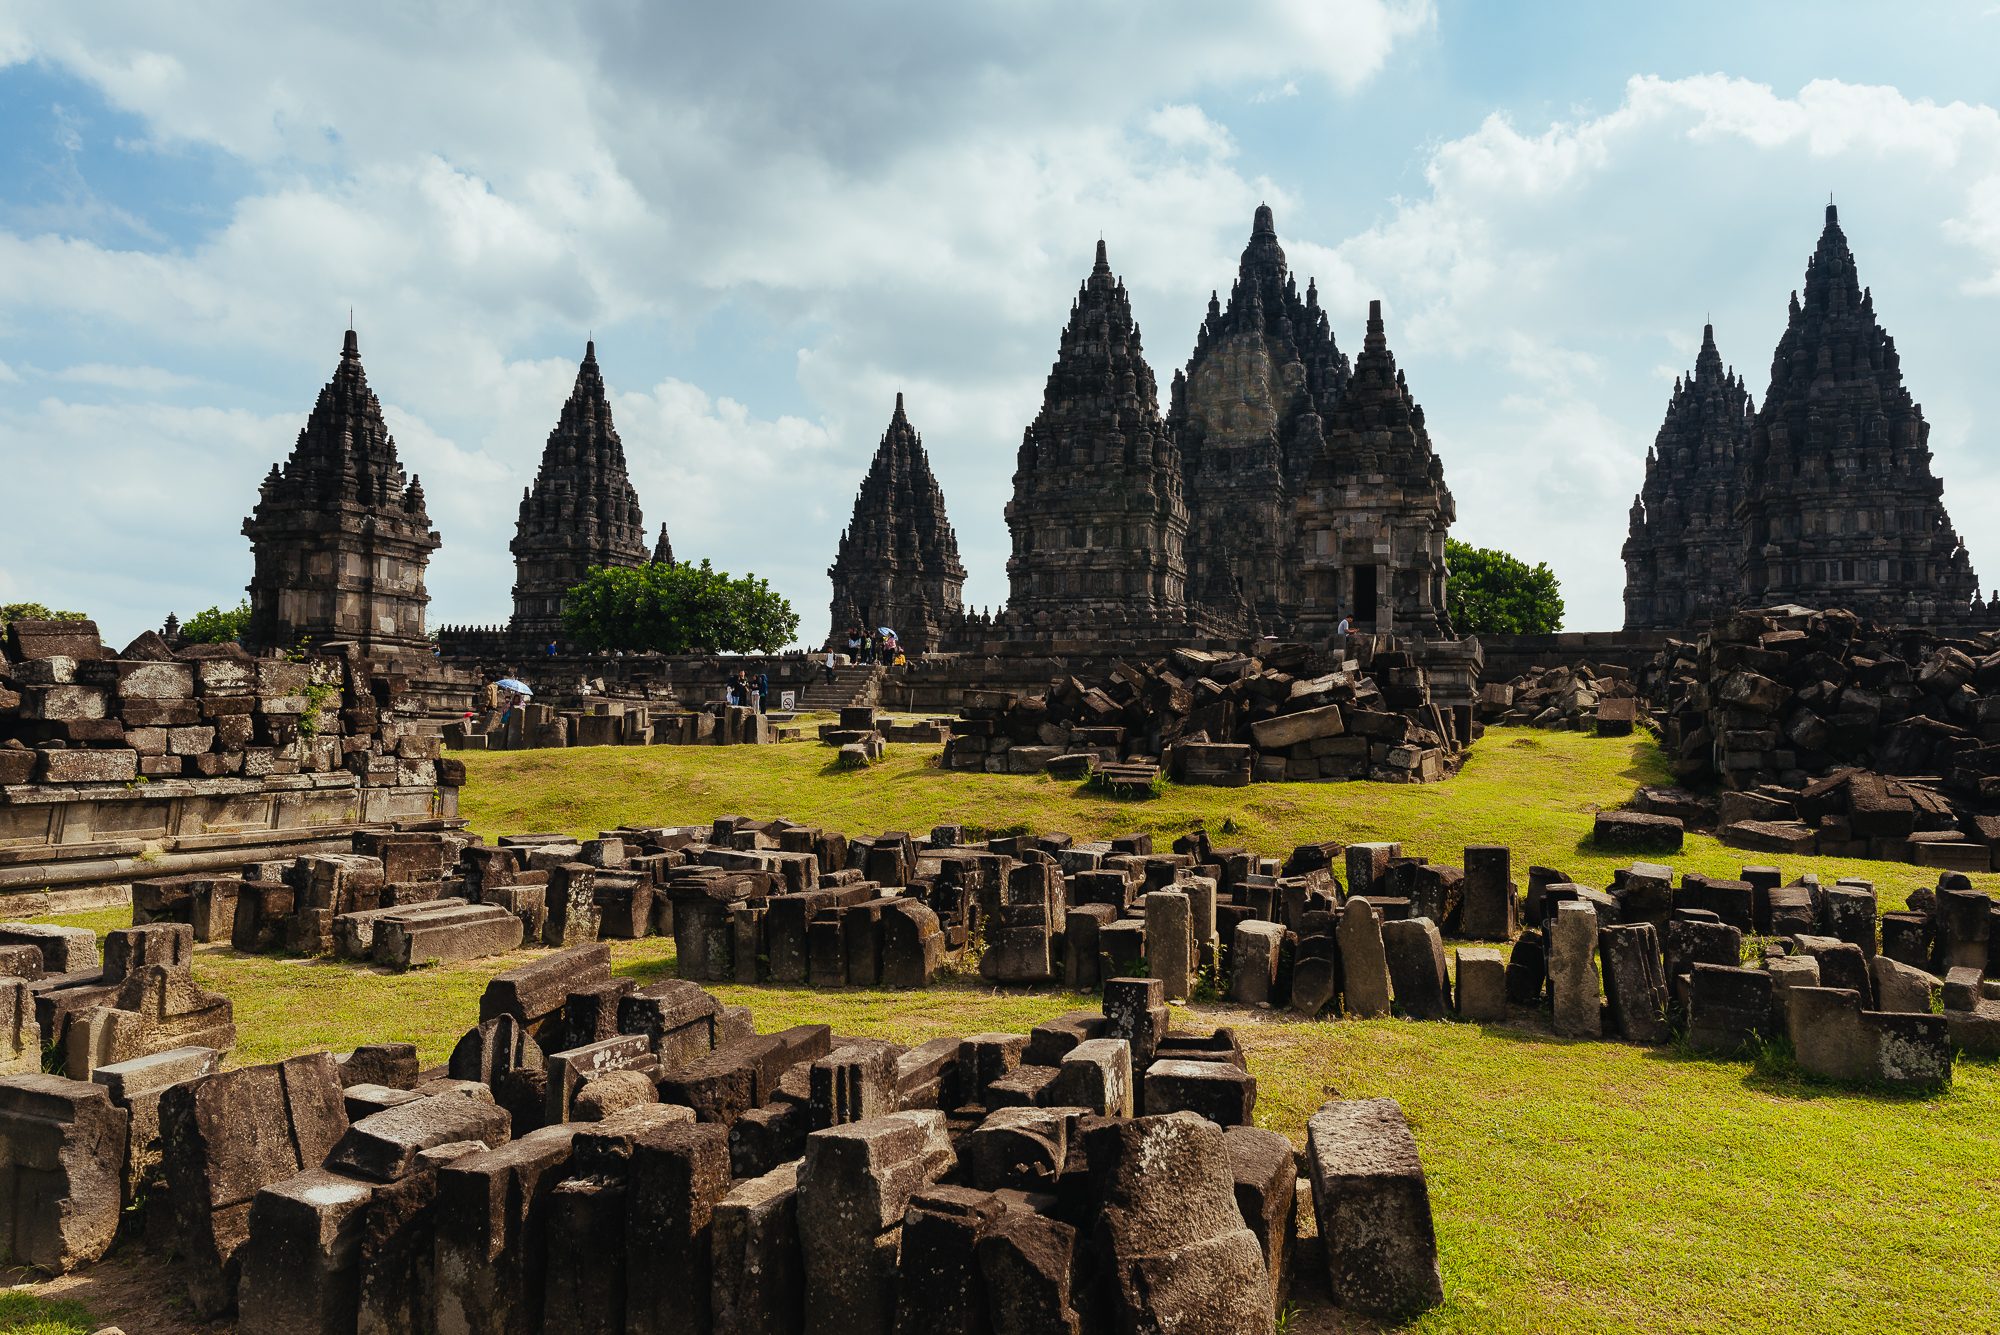 indonesia_2017-1050.jpg